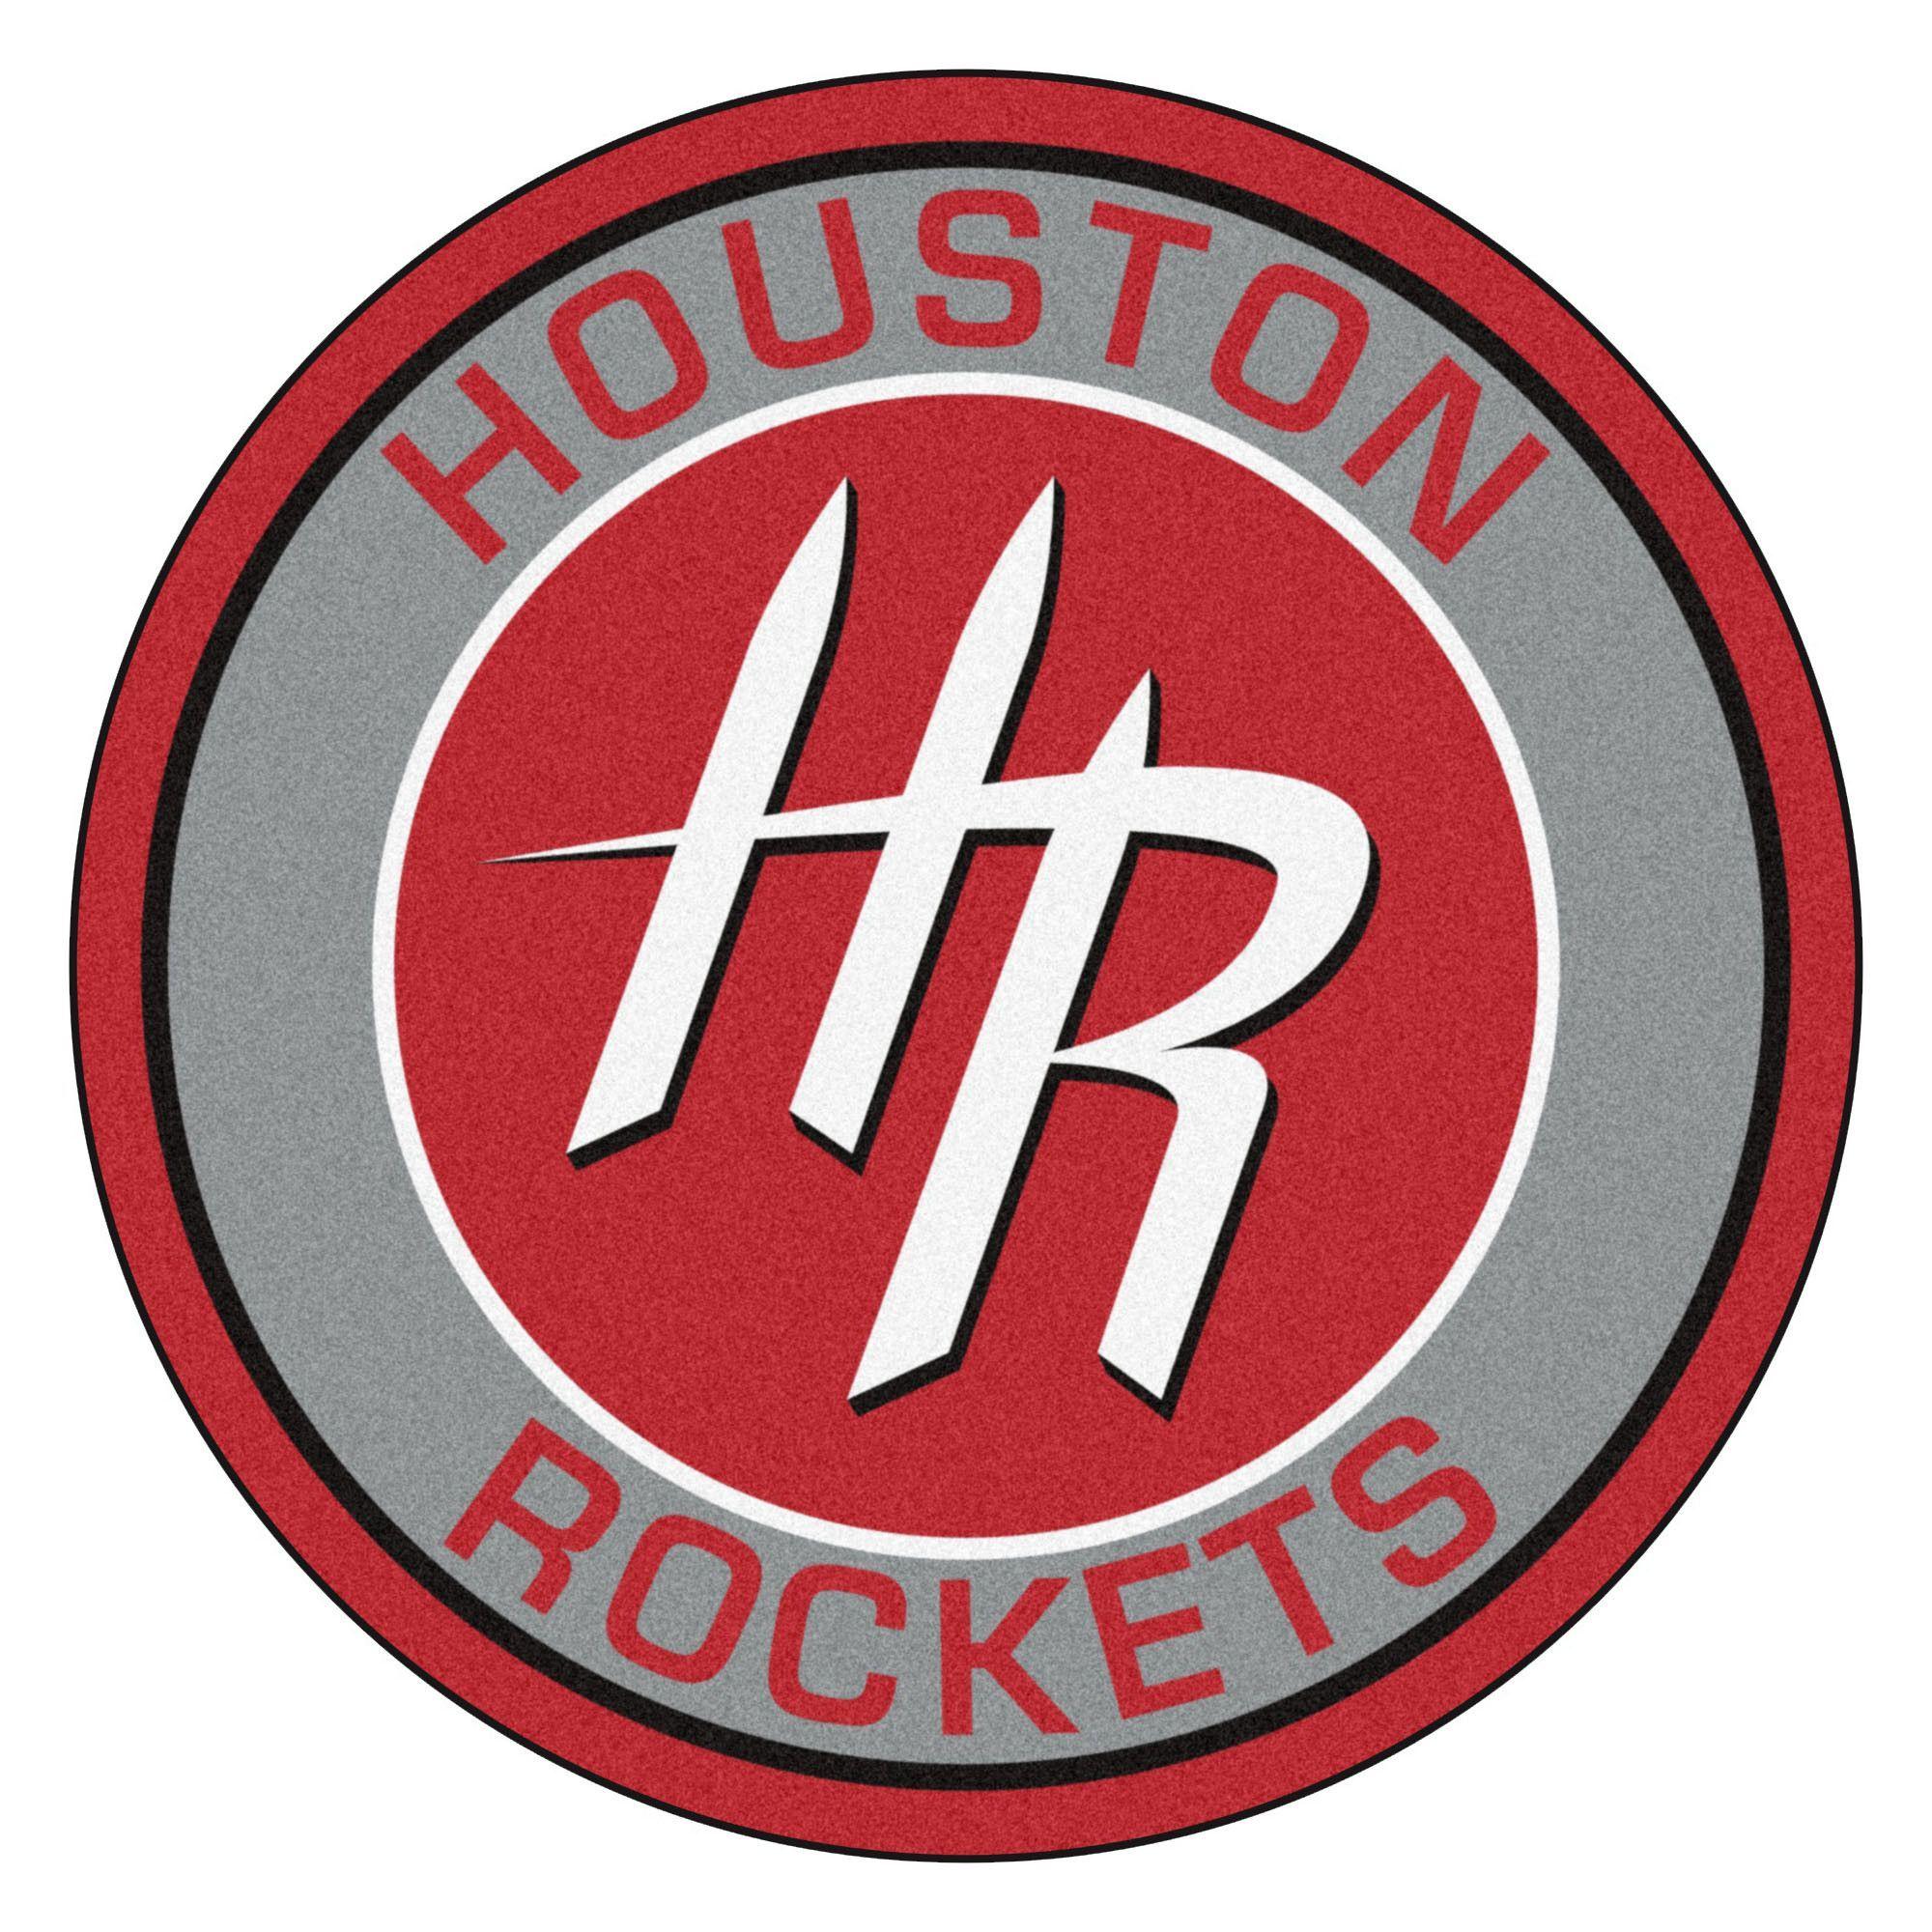 Nba Houston Rockets Roundel 27 In X 27 In Non Slip Indoor Only Mat Nba Houston Rockets Houston Rockets Houston Rockets Team